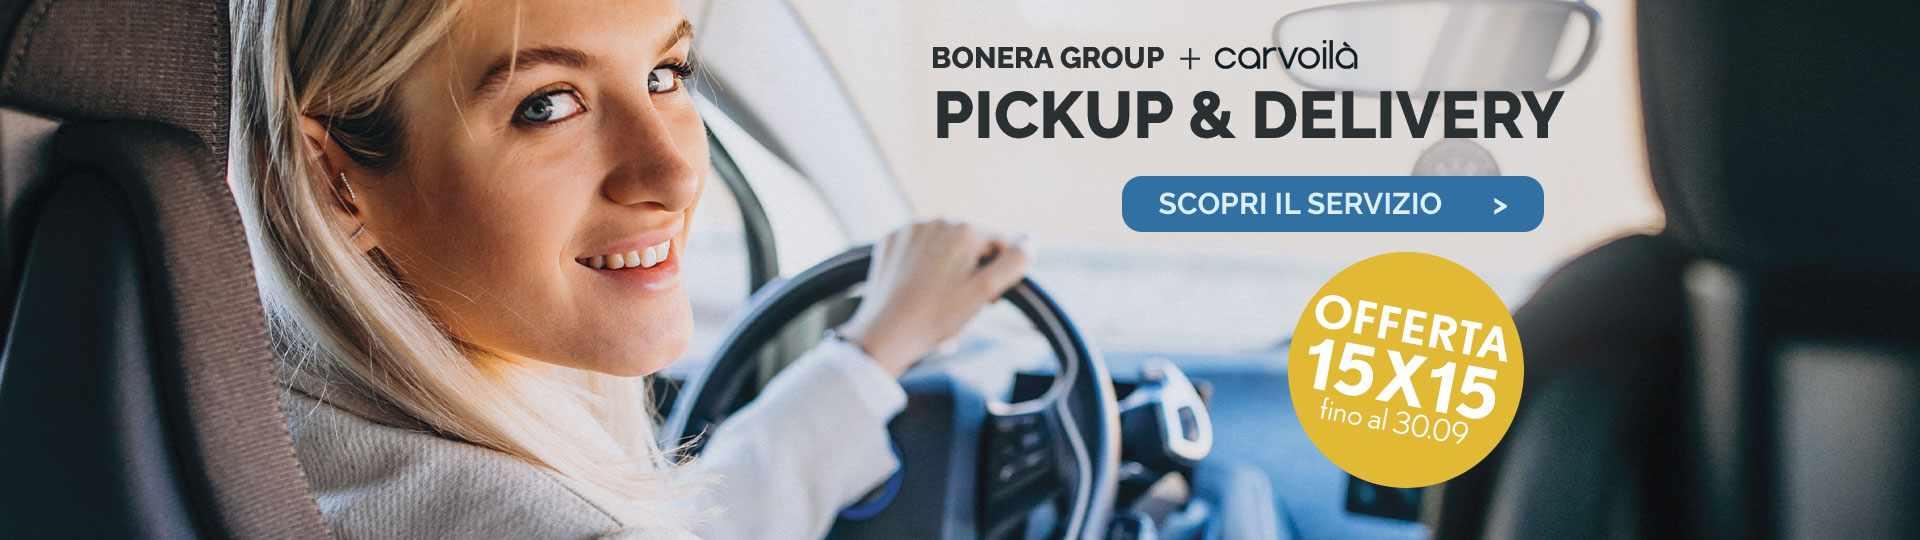 header_pickup_delivery_carvoila_bonera_maggio_2021_v2.jpg